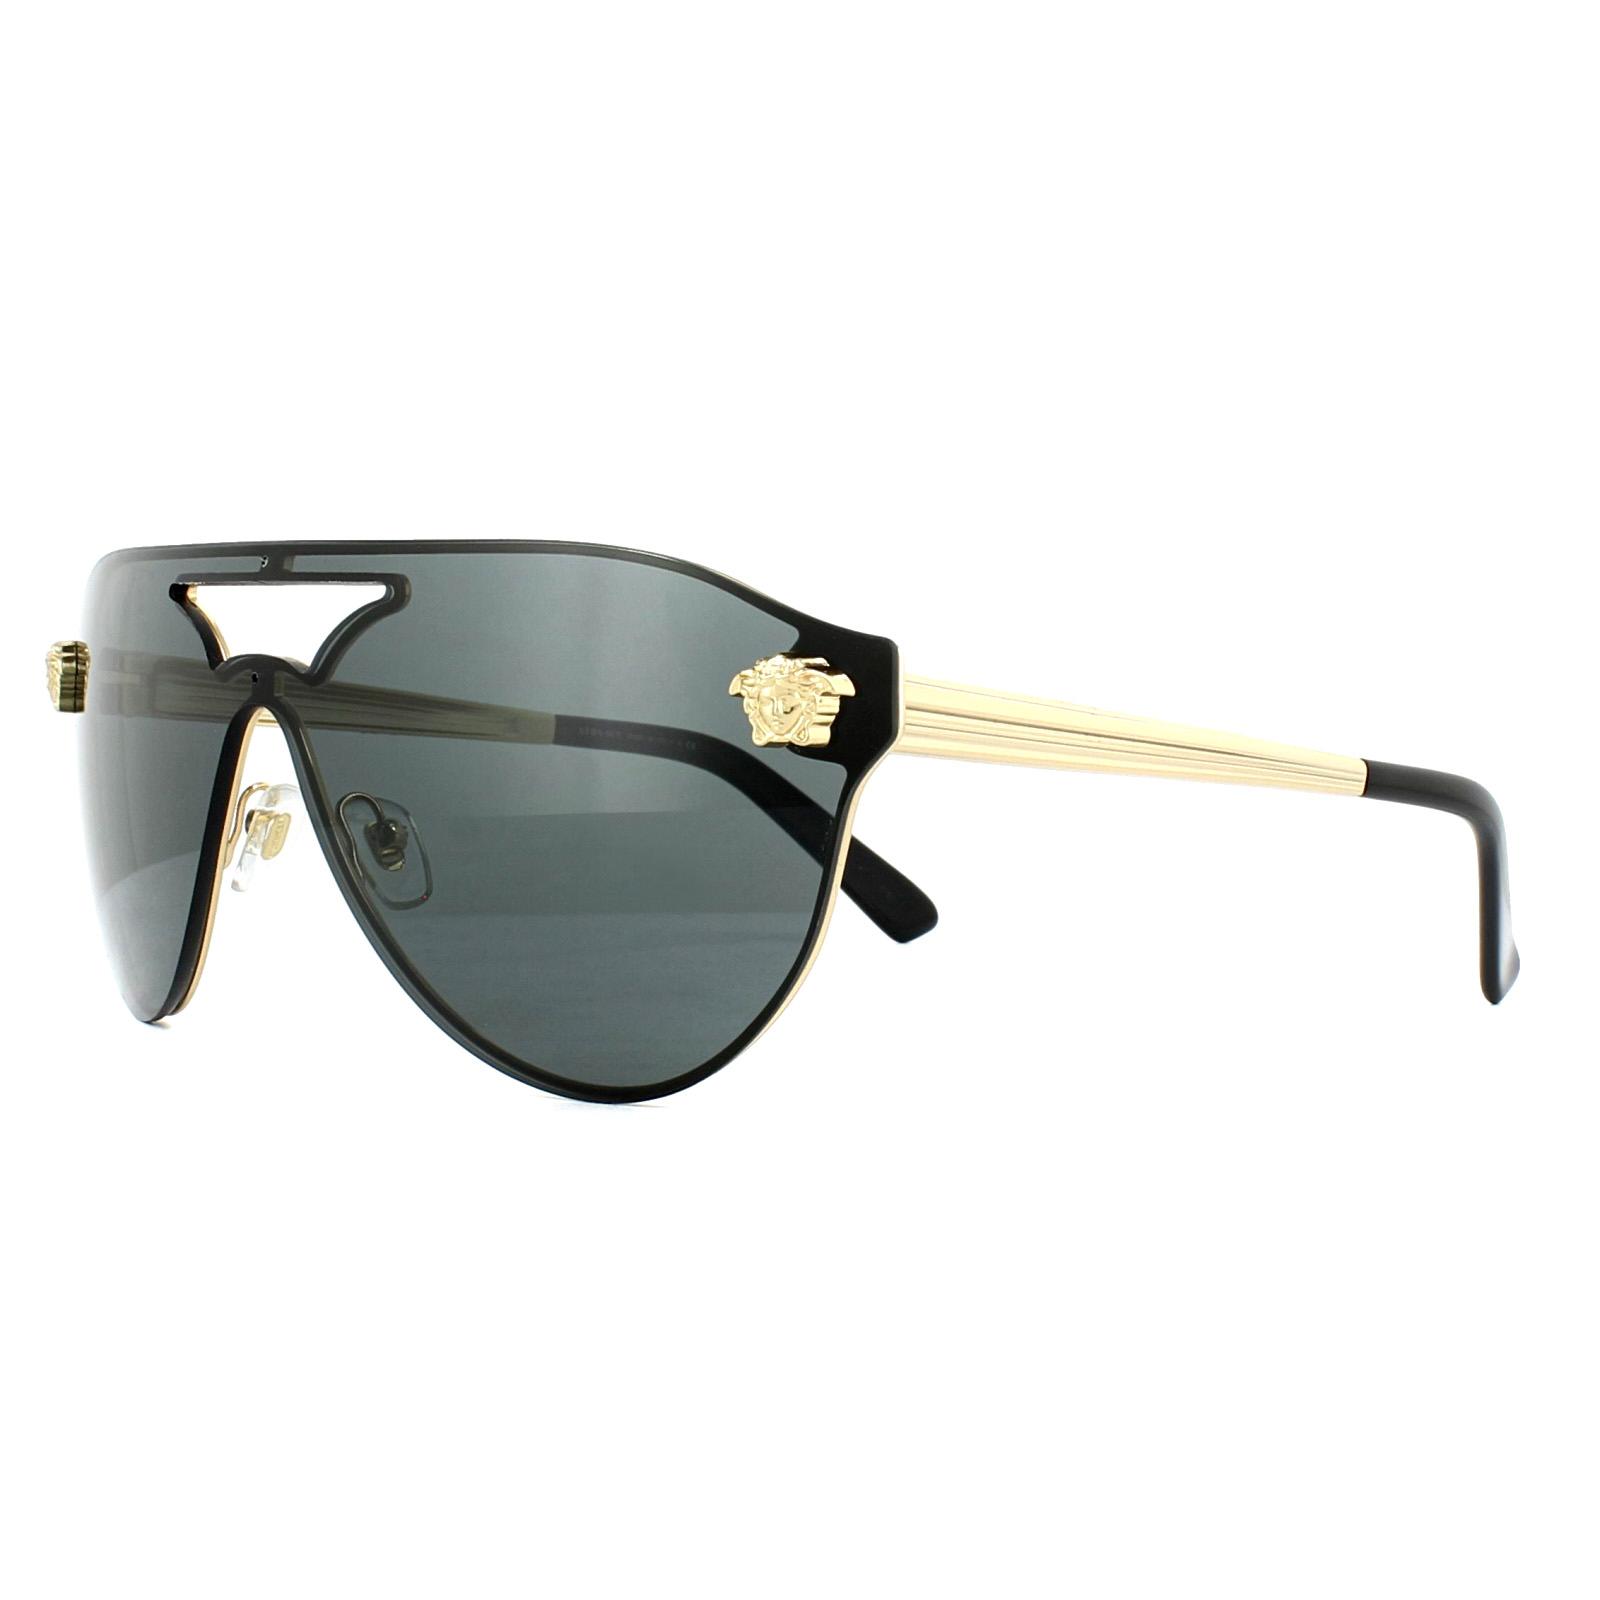 9b86d4a96d1d Sentinel Thumbnail 1. Sentinel Versace Sunglasses VE2161 100287 Gold Black  Grey